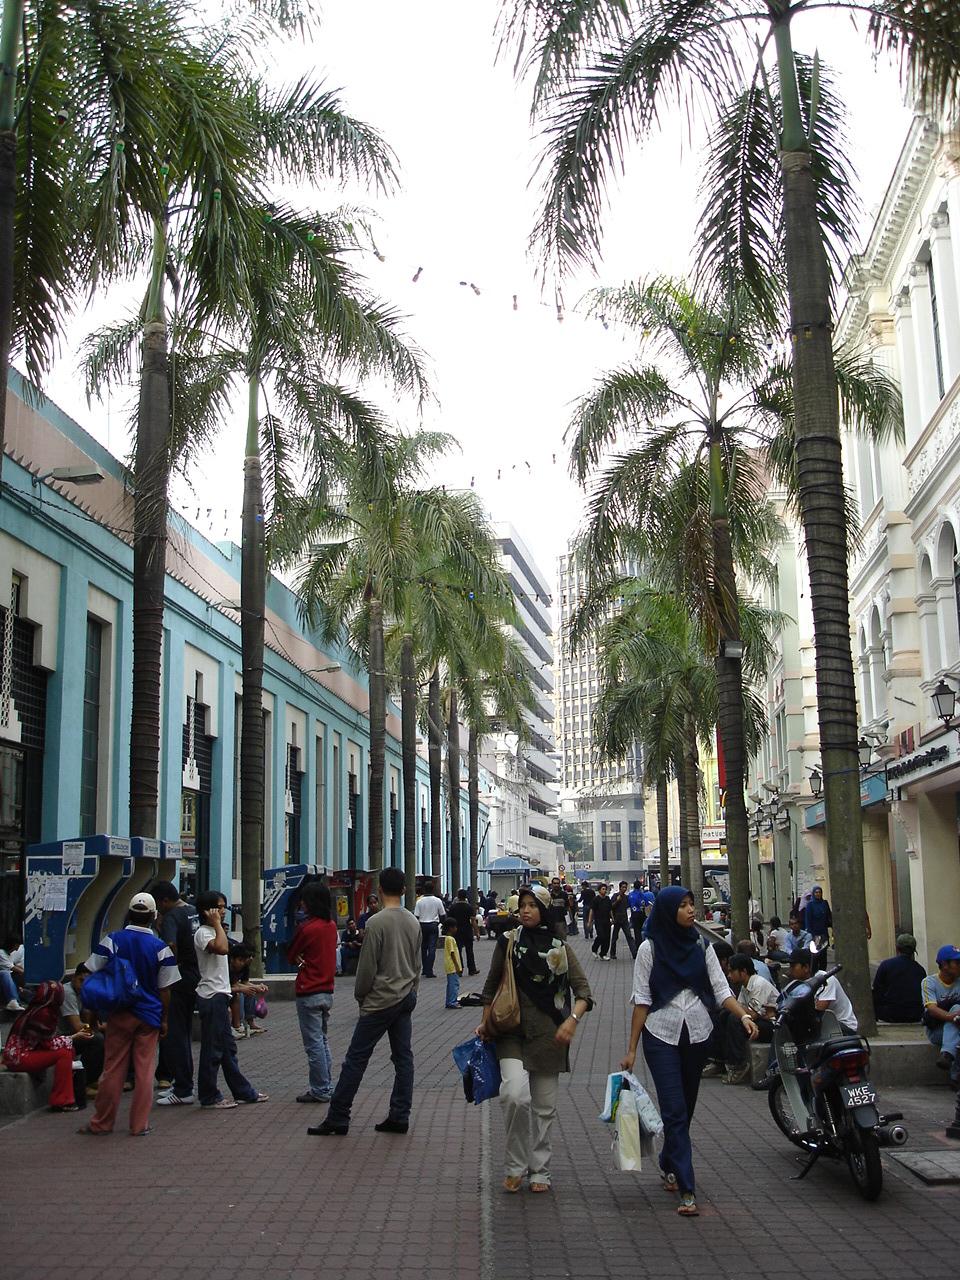 A pedestrian mall by KL's central market